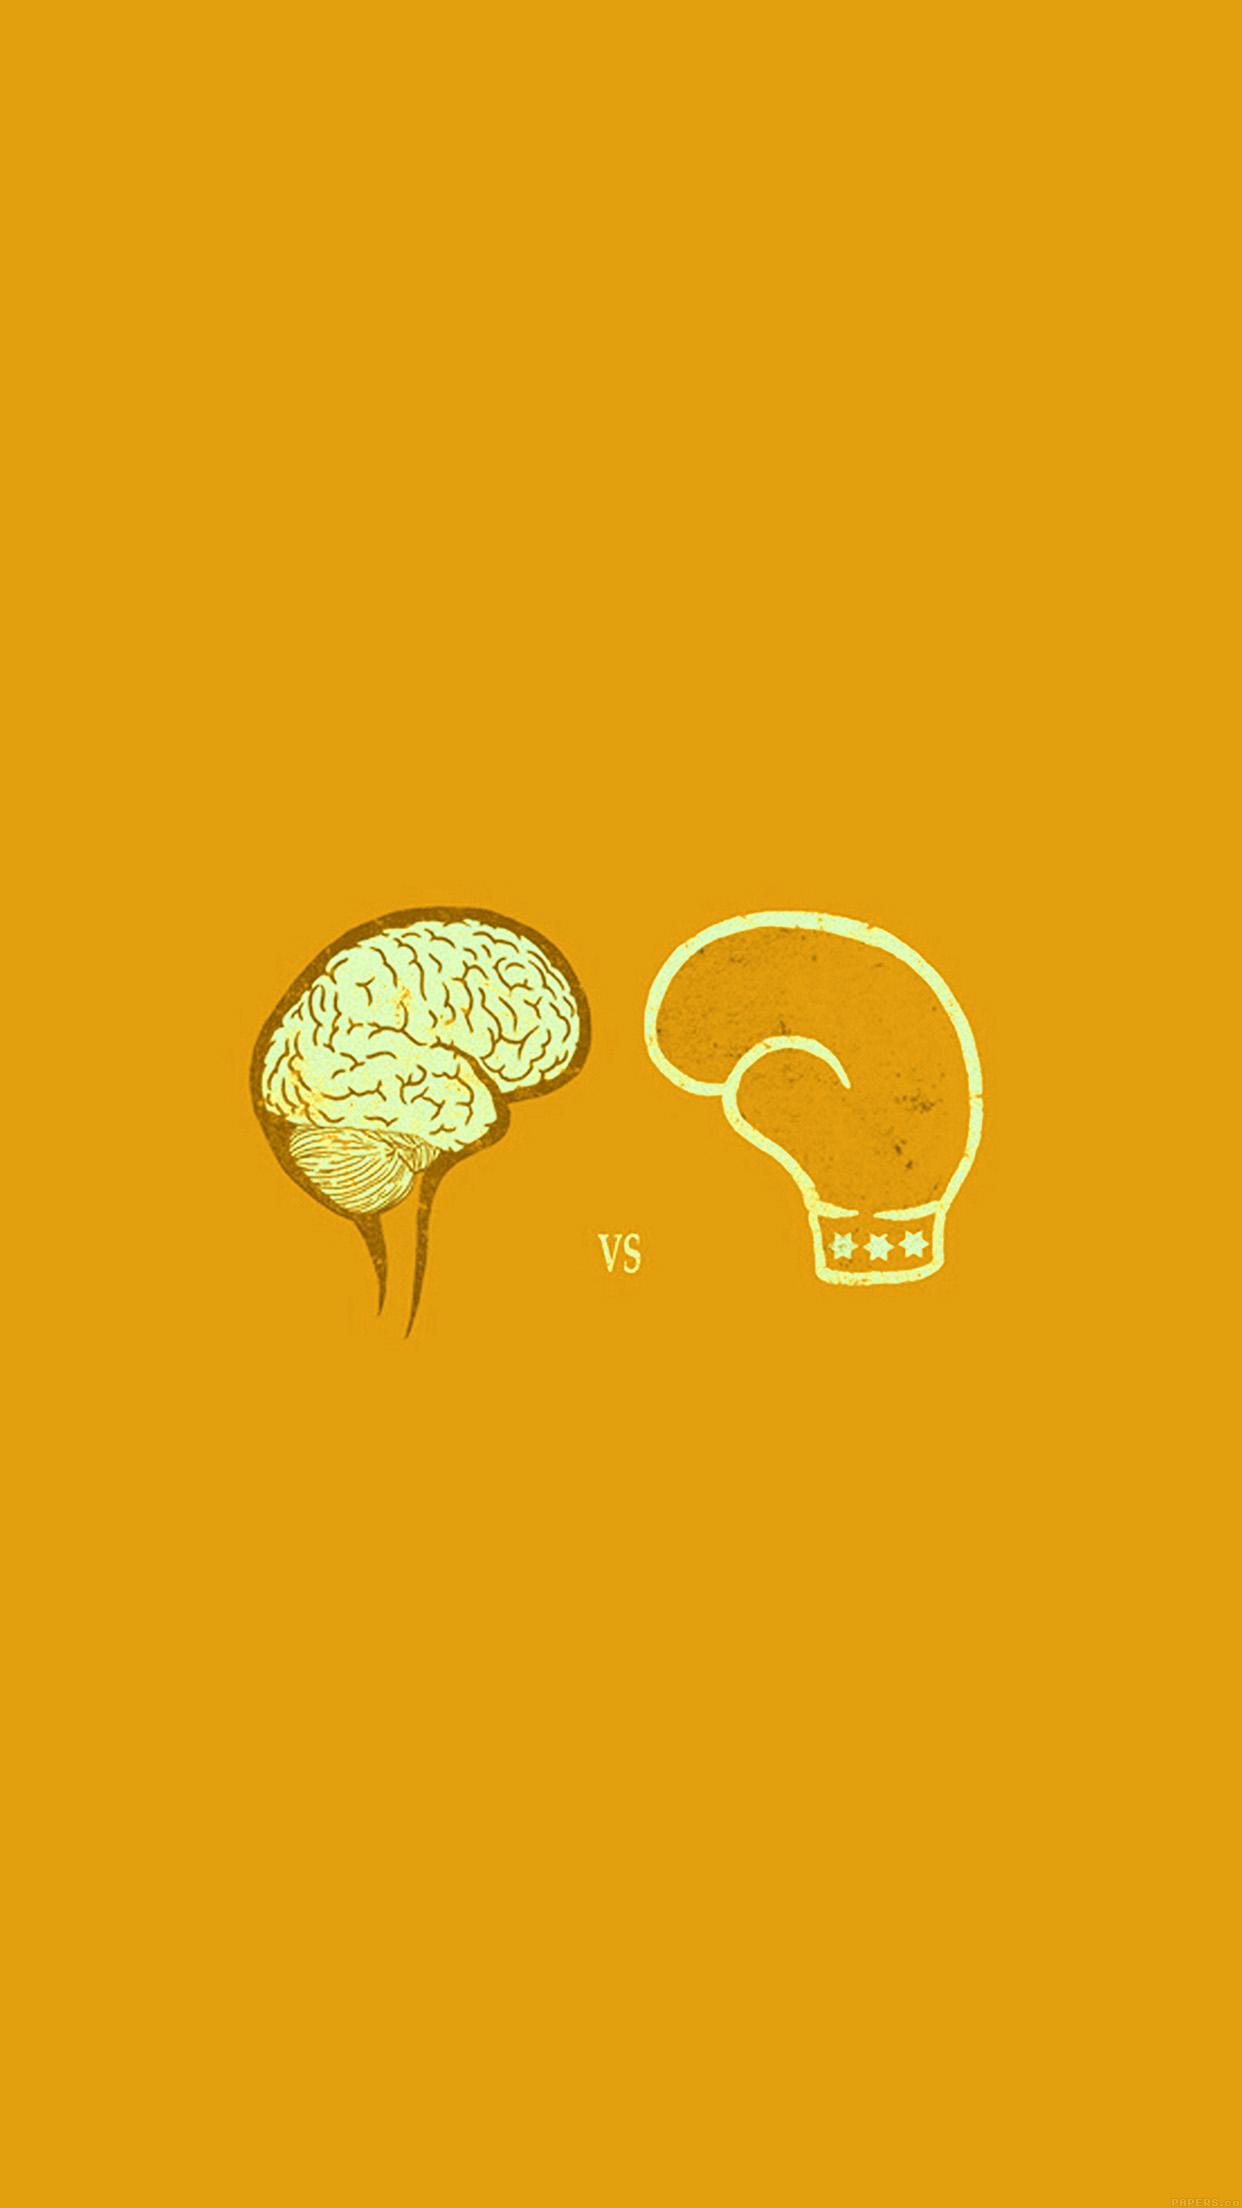 Naruto Wallpaper Hd Iphone 6 Ai23 Brain Vs Boxing Illust Gold Minimal Art Wallpaper